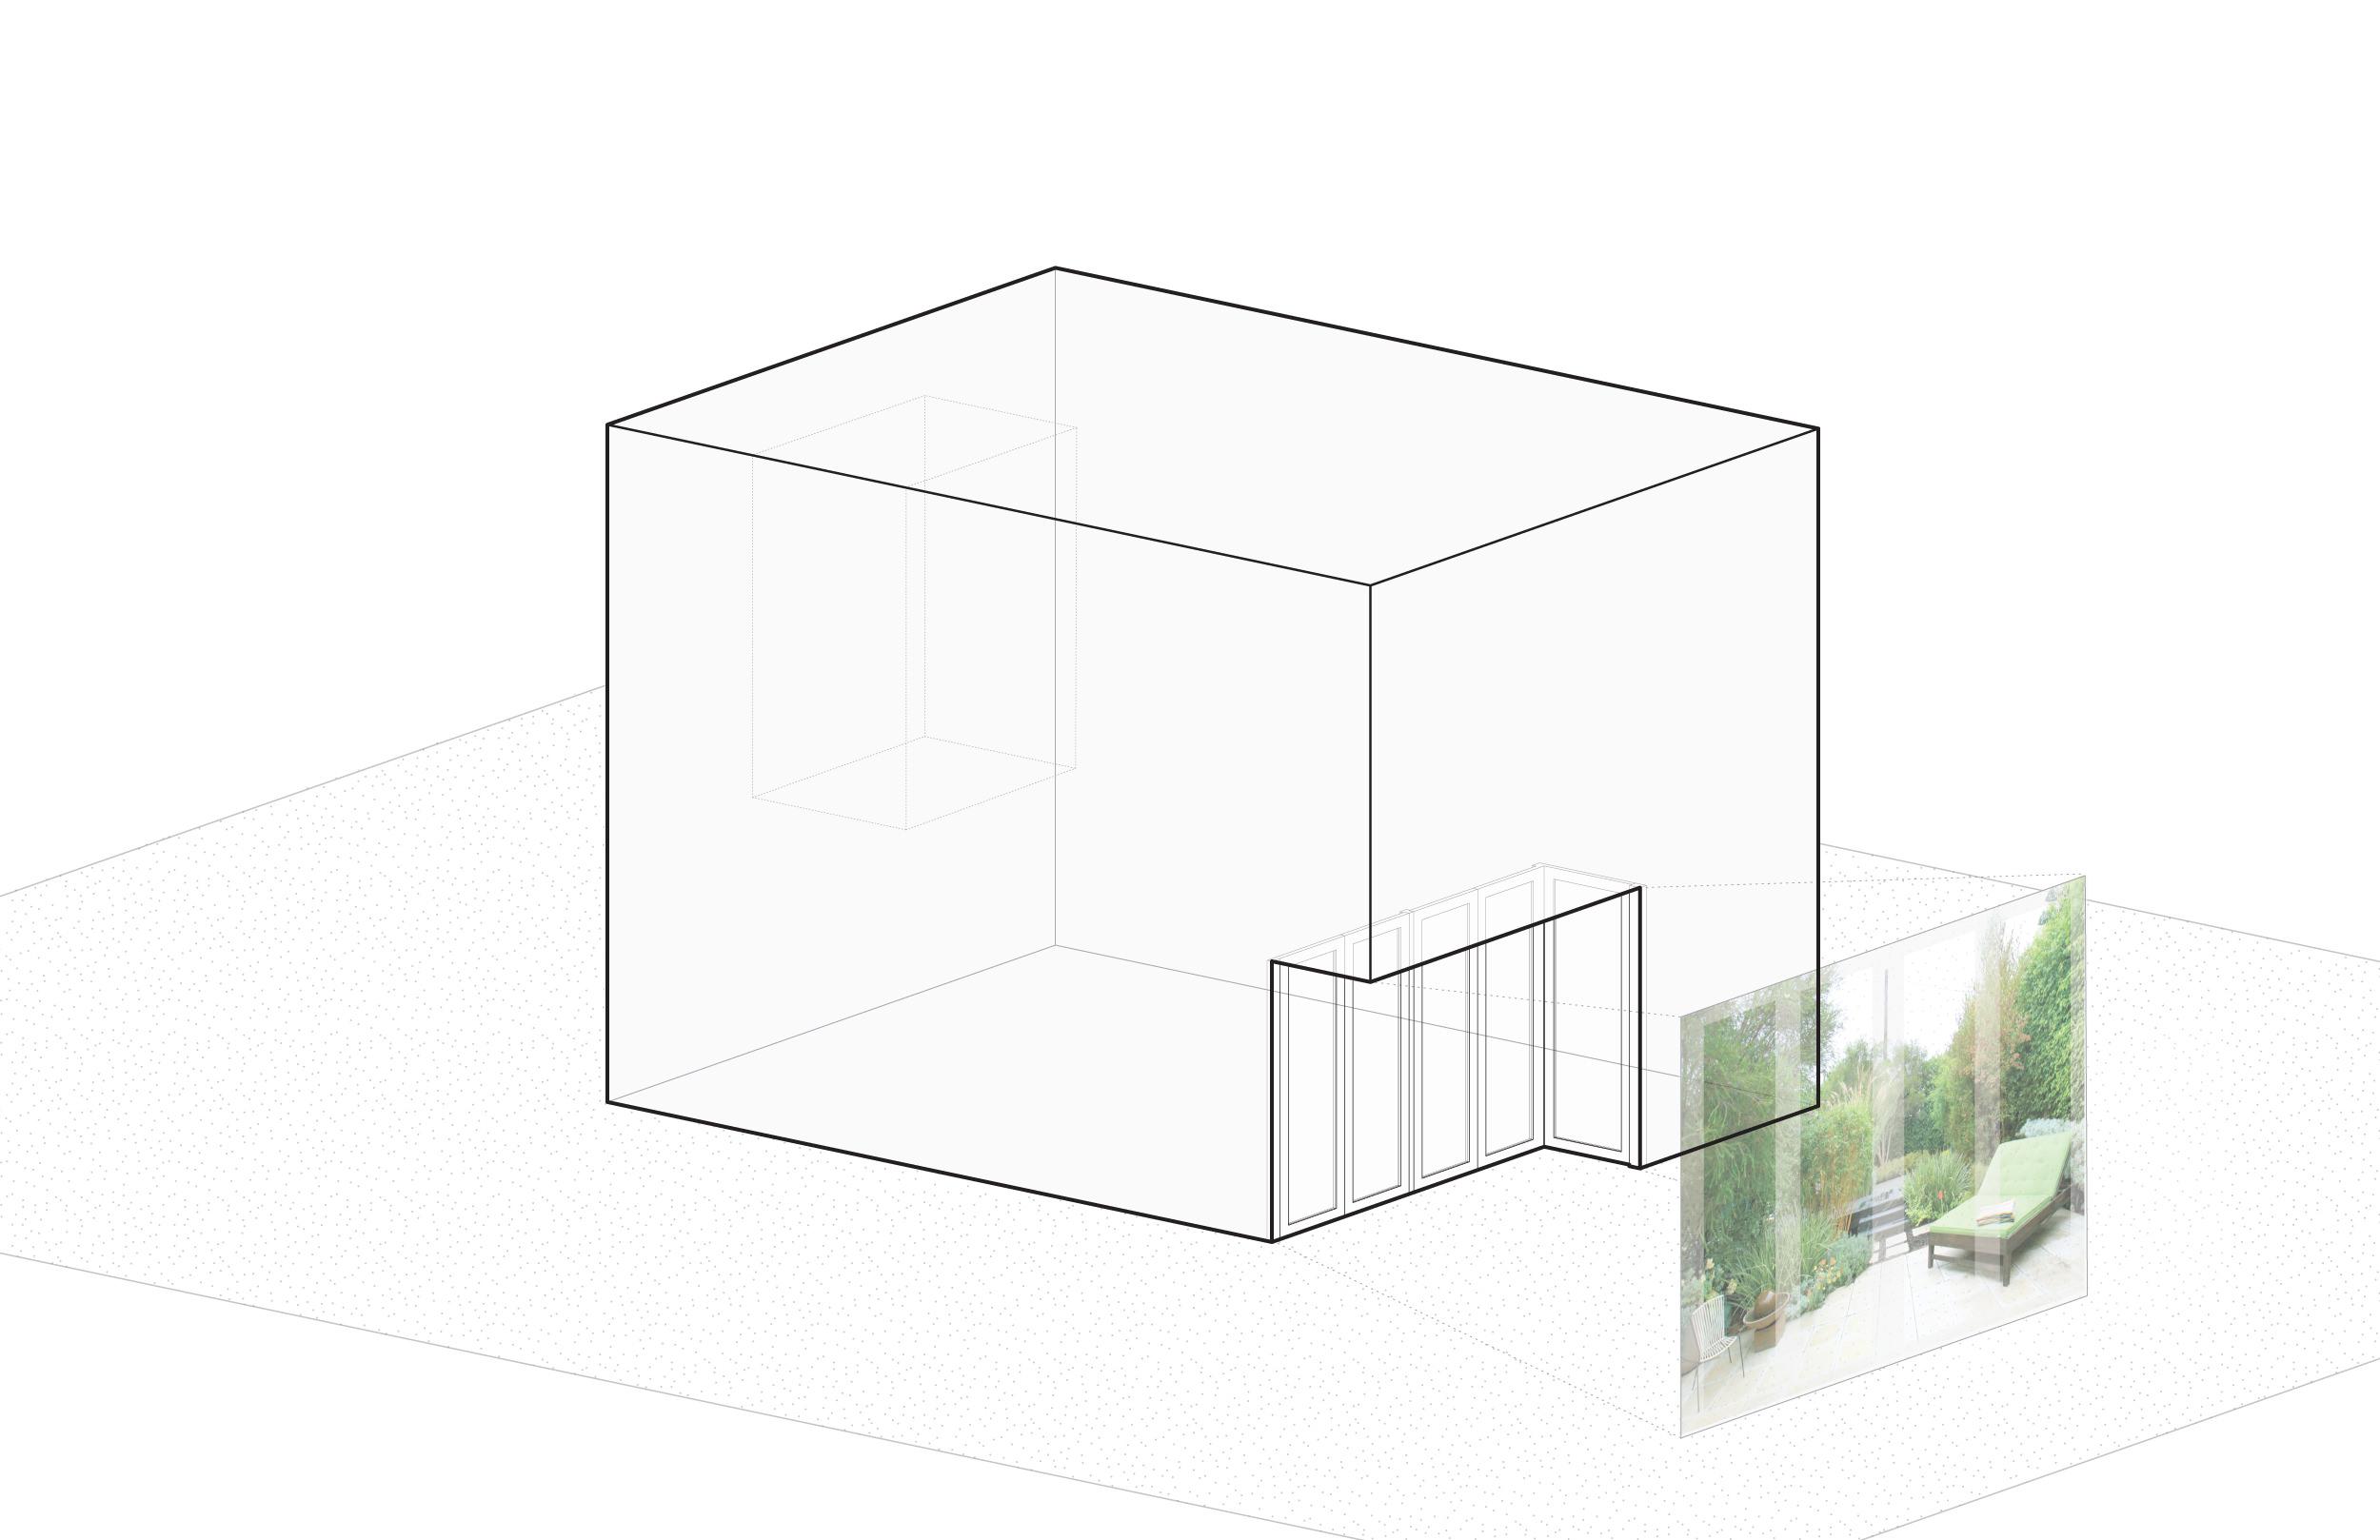 Studio-City-House_Diagram_02.jpg